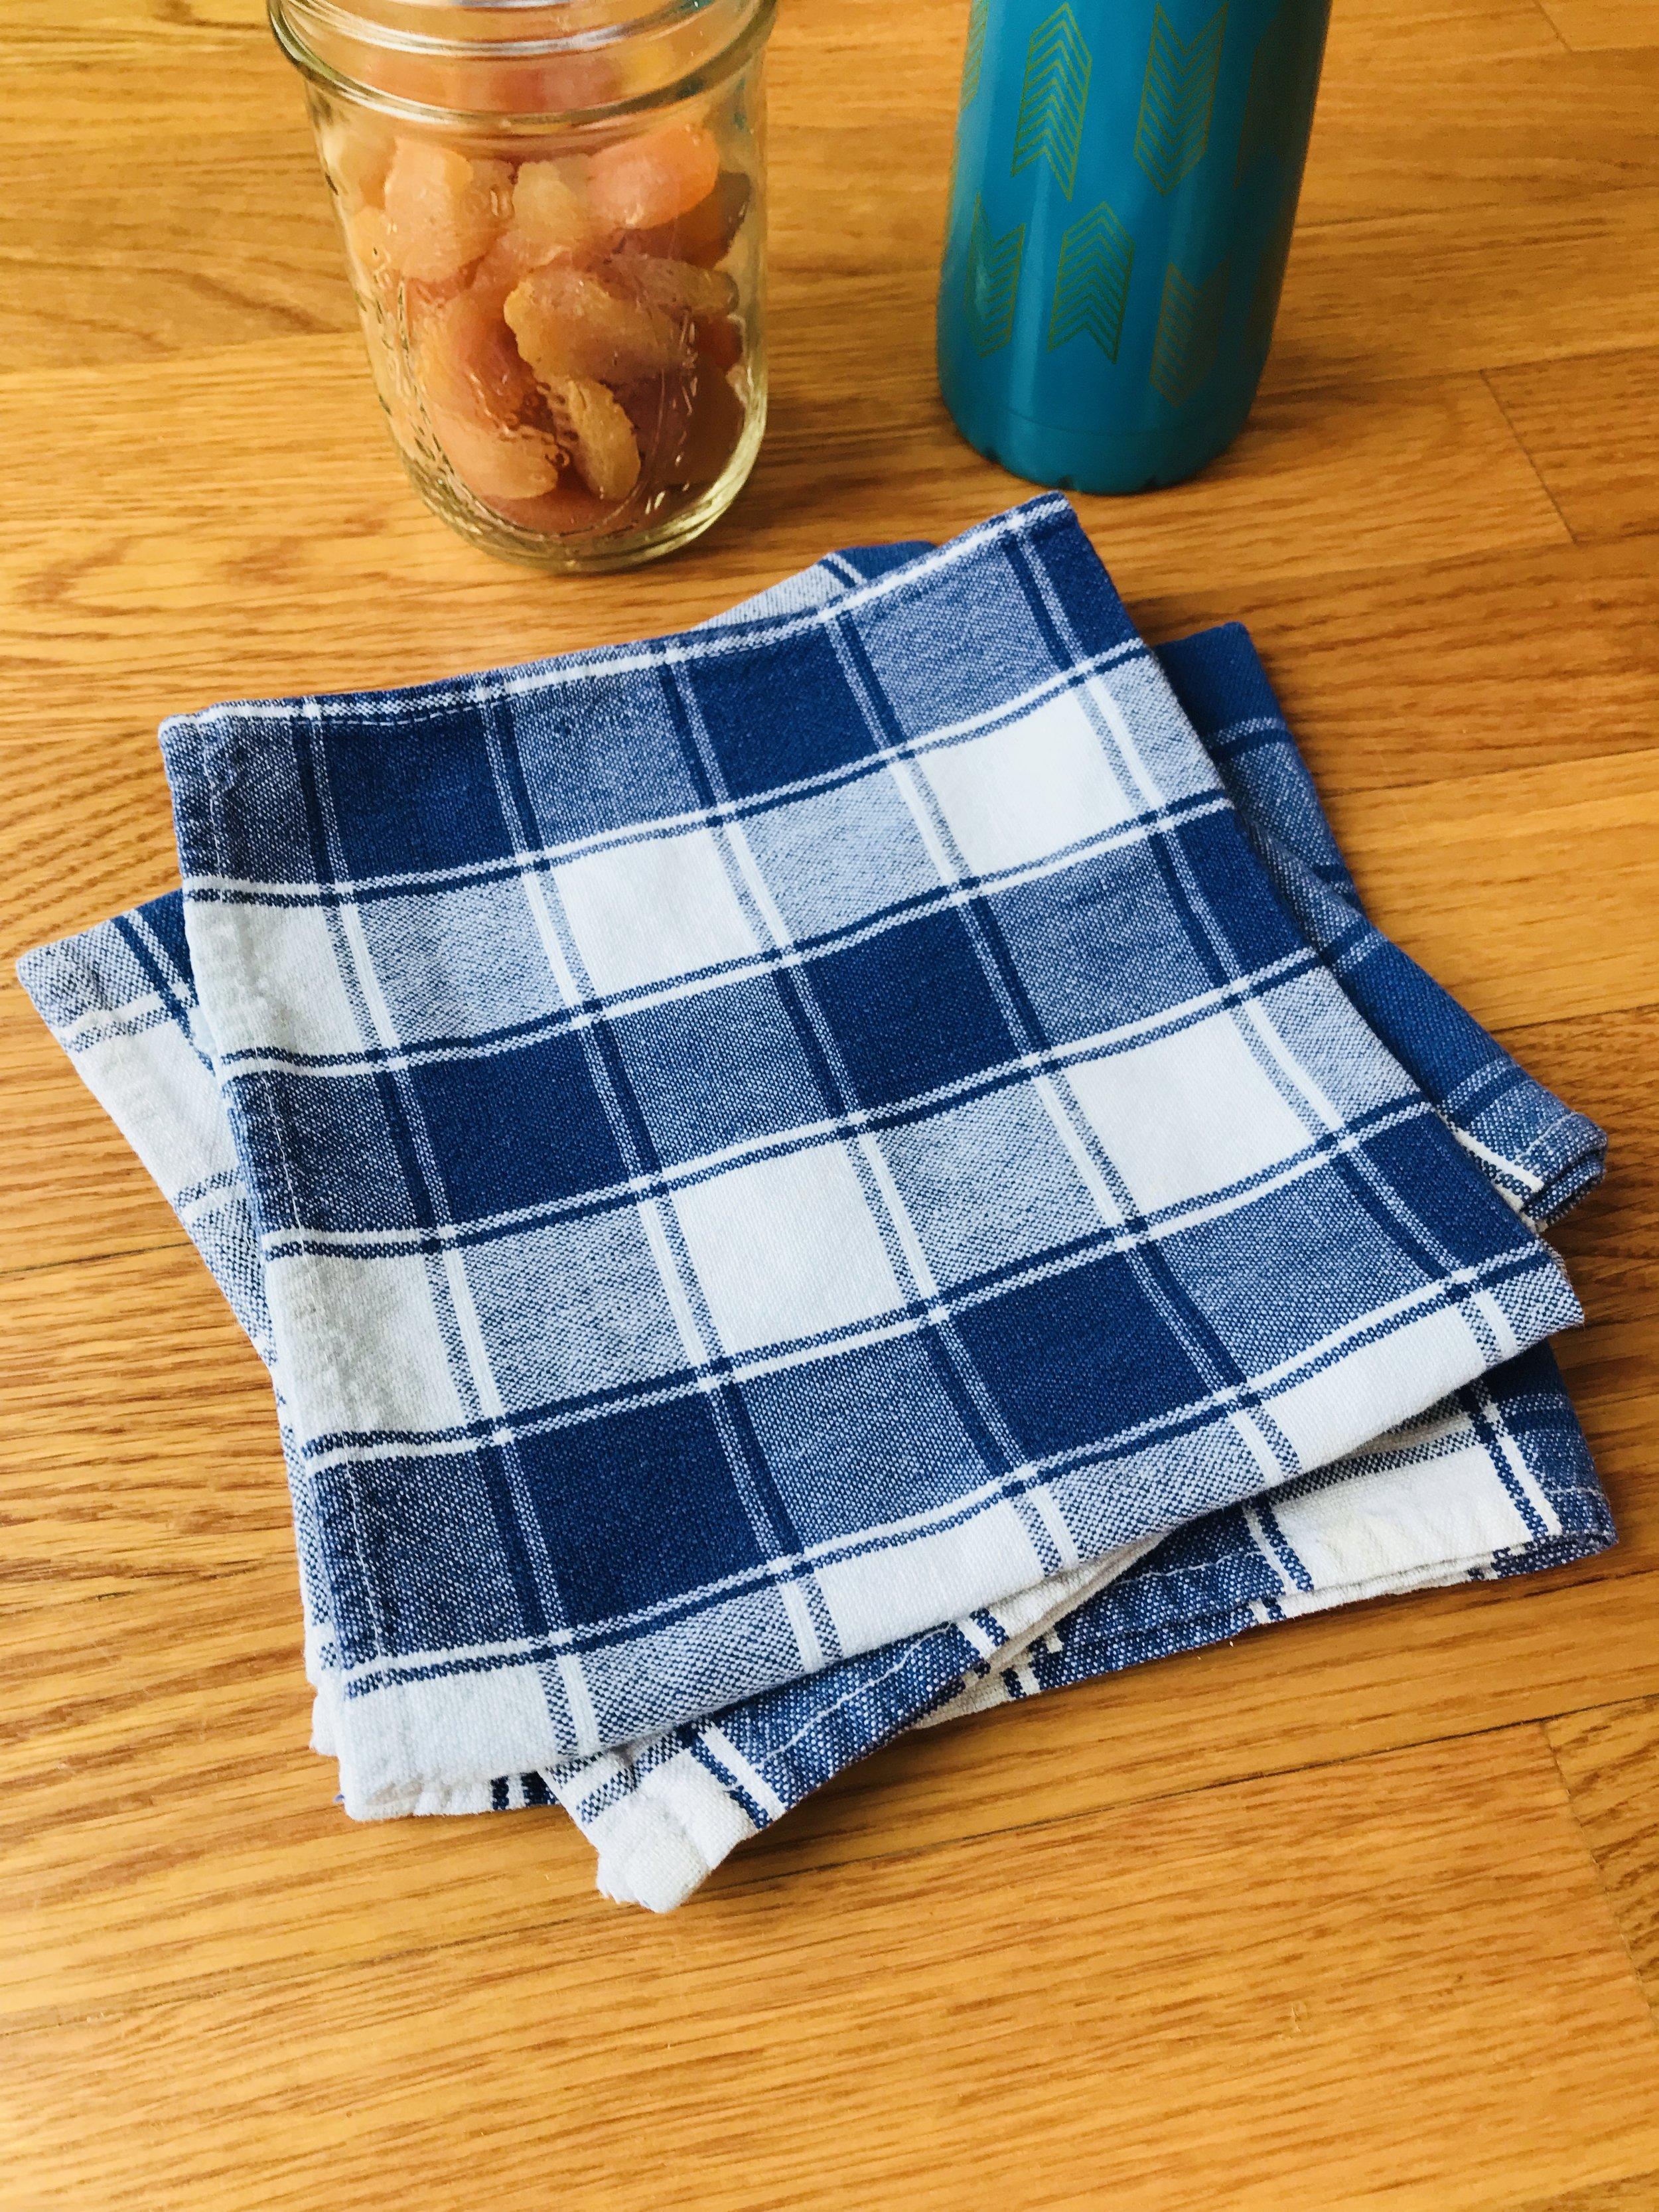 - Cloth Napkins! Easy Peasy switch.